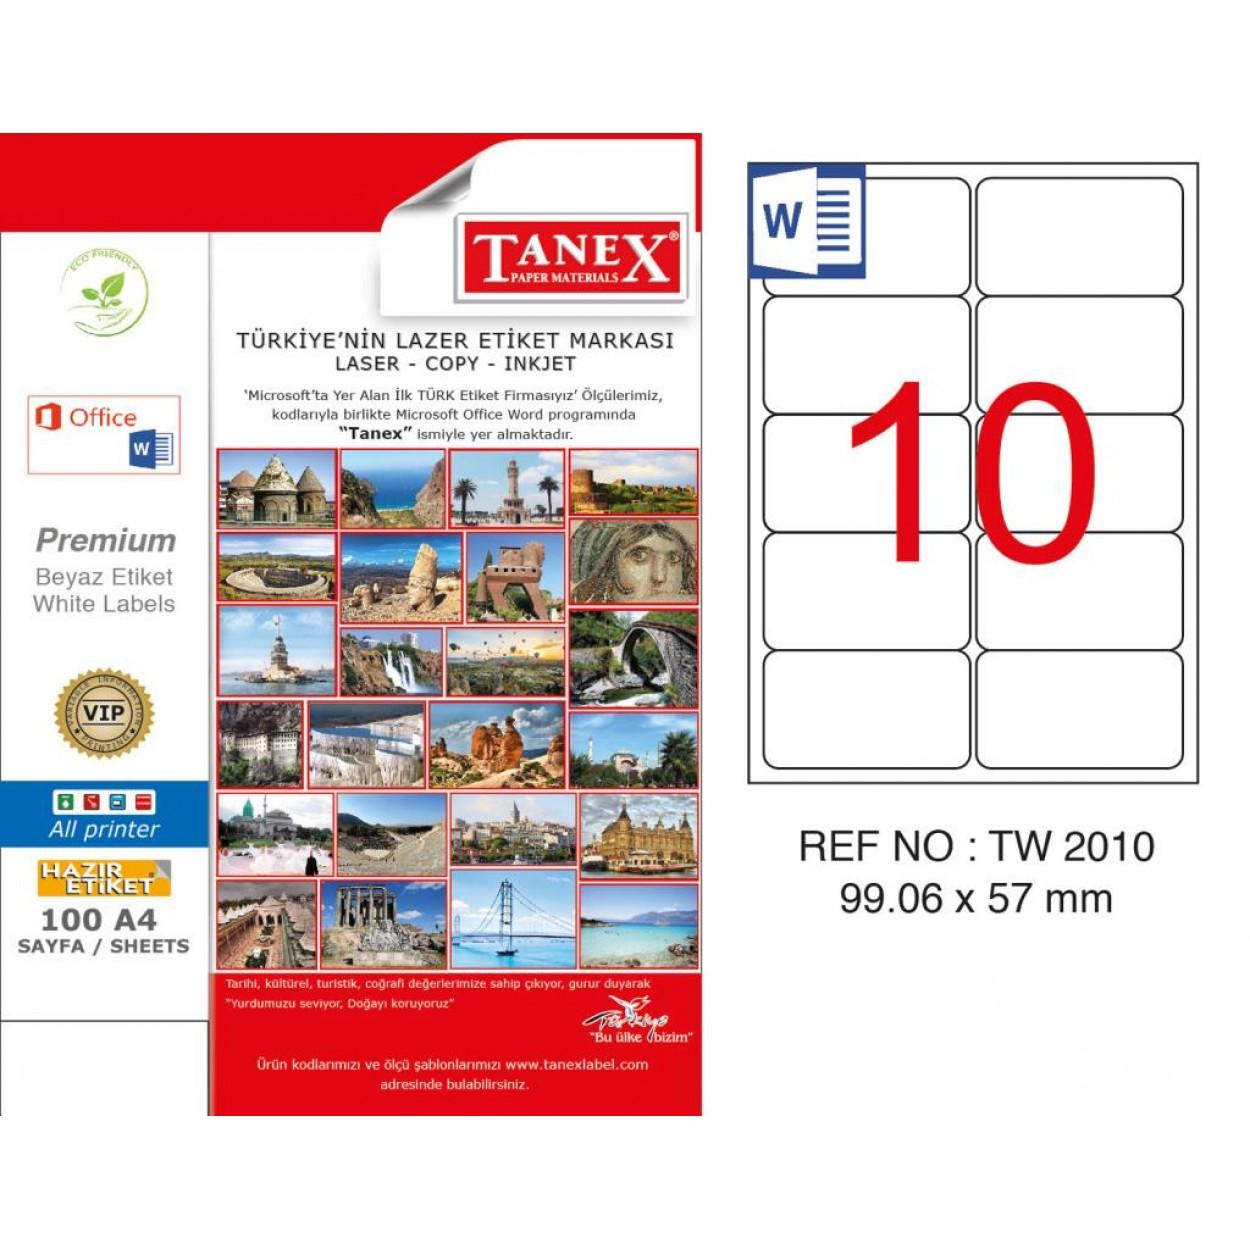 Tanex TW-2010 99,06x57mm Kuşe Laser Etiket 100 Lü Paket